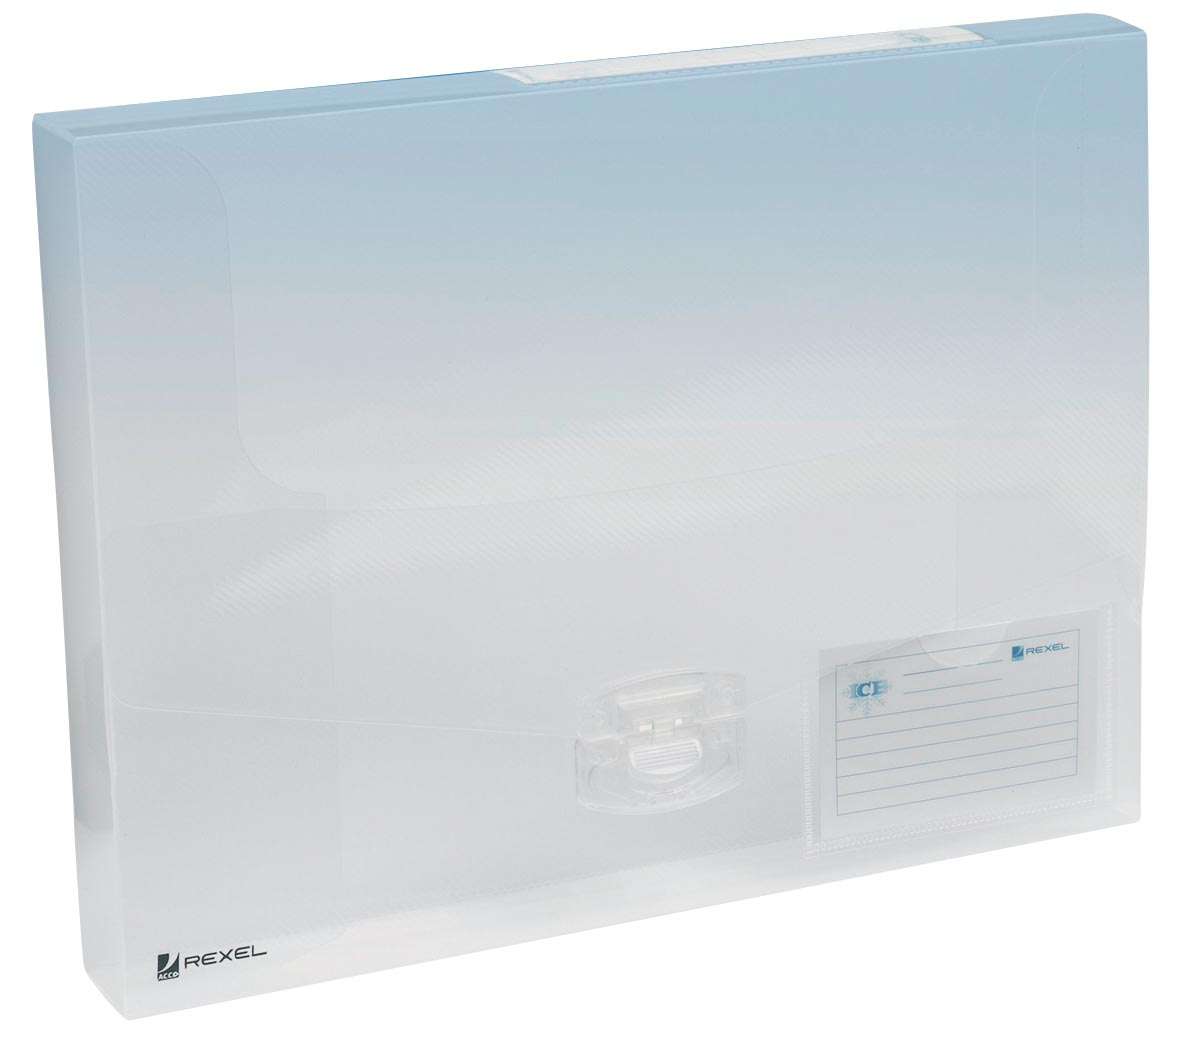 Rexel elastobox Ice transparant, rug van 4 cm